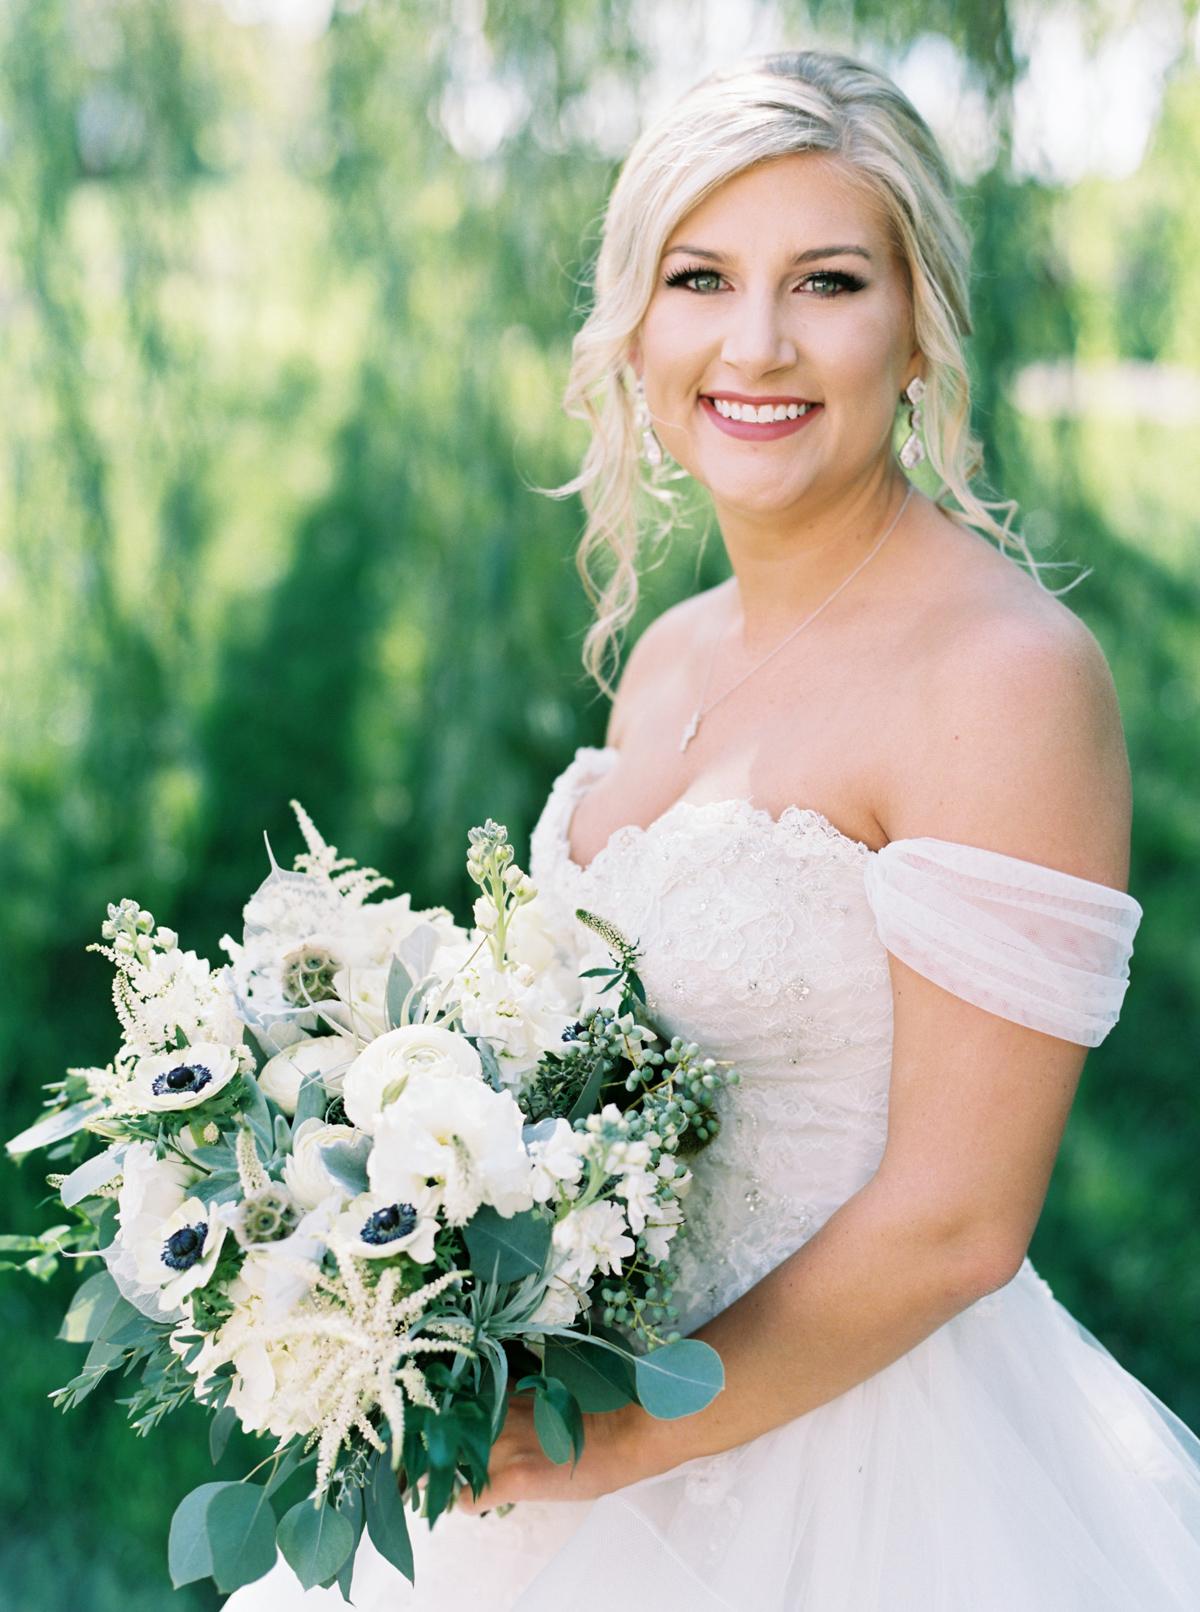 winmock-kinderton-wedding-016.jpg